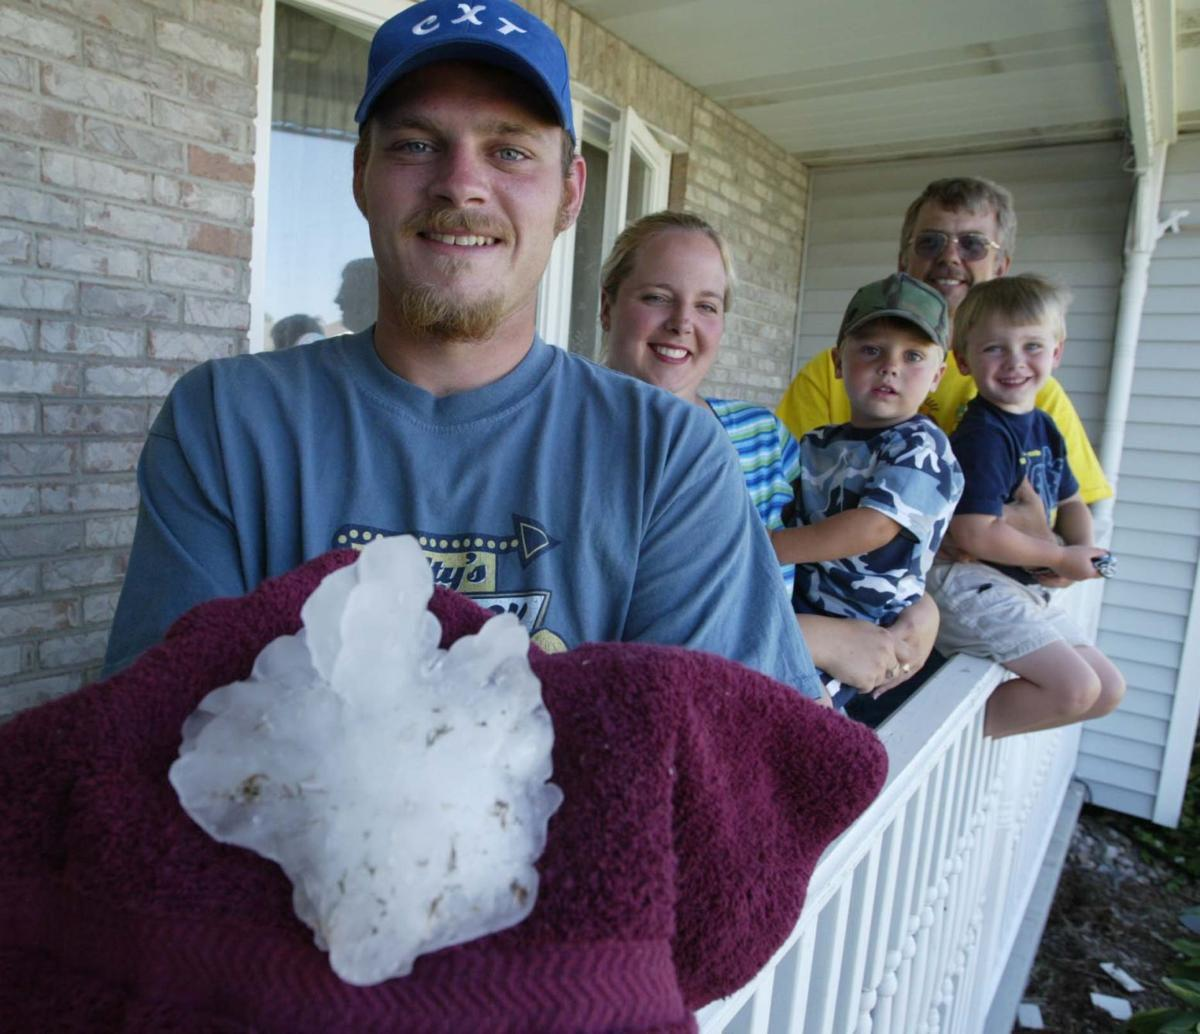 A Rare 'bomb Cyclone' Is Hitting Nebraska. Here's What To